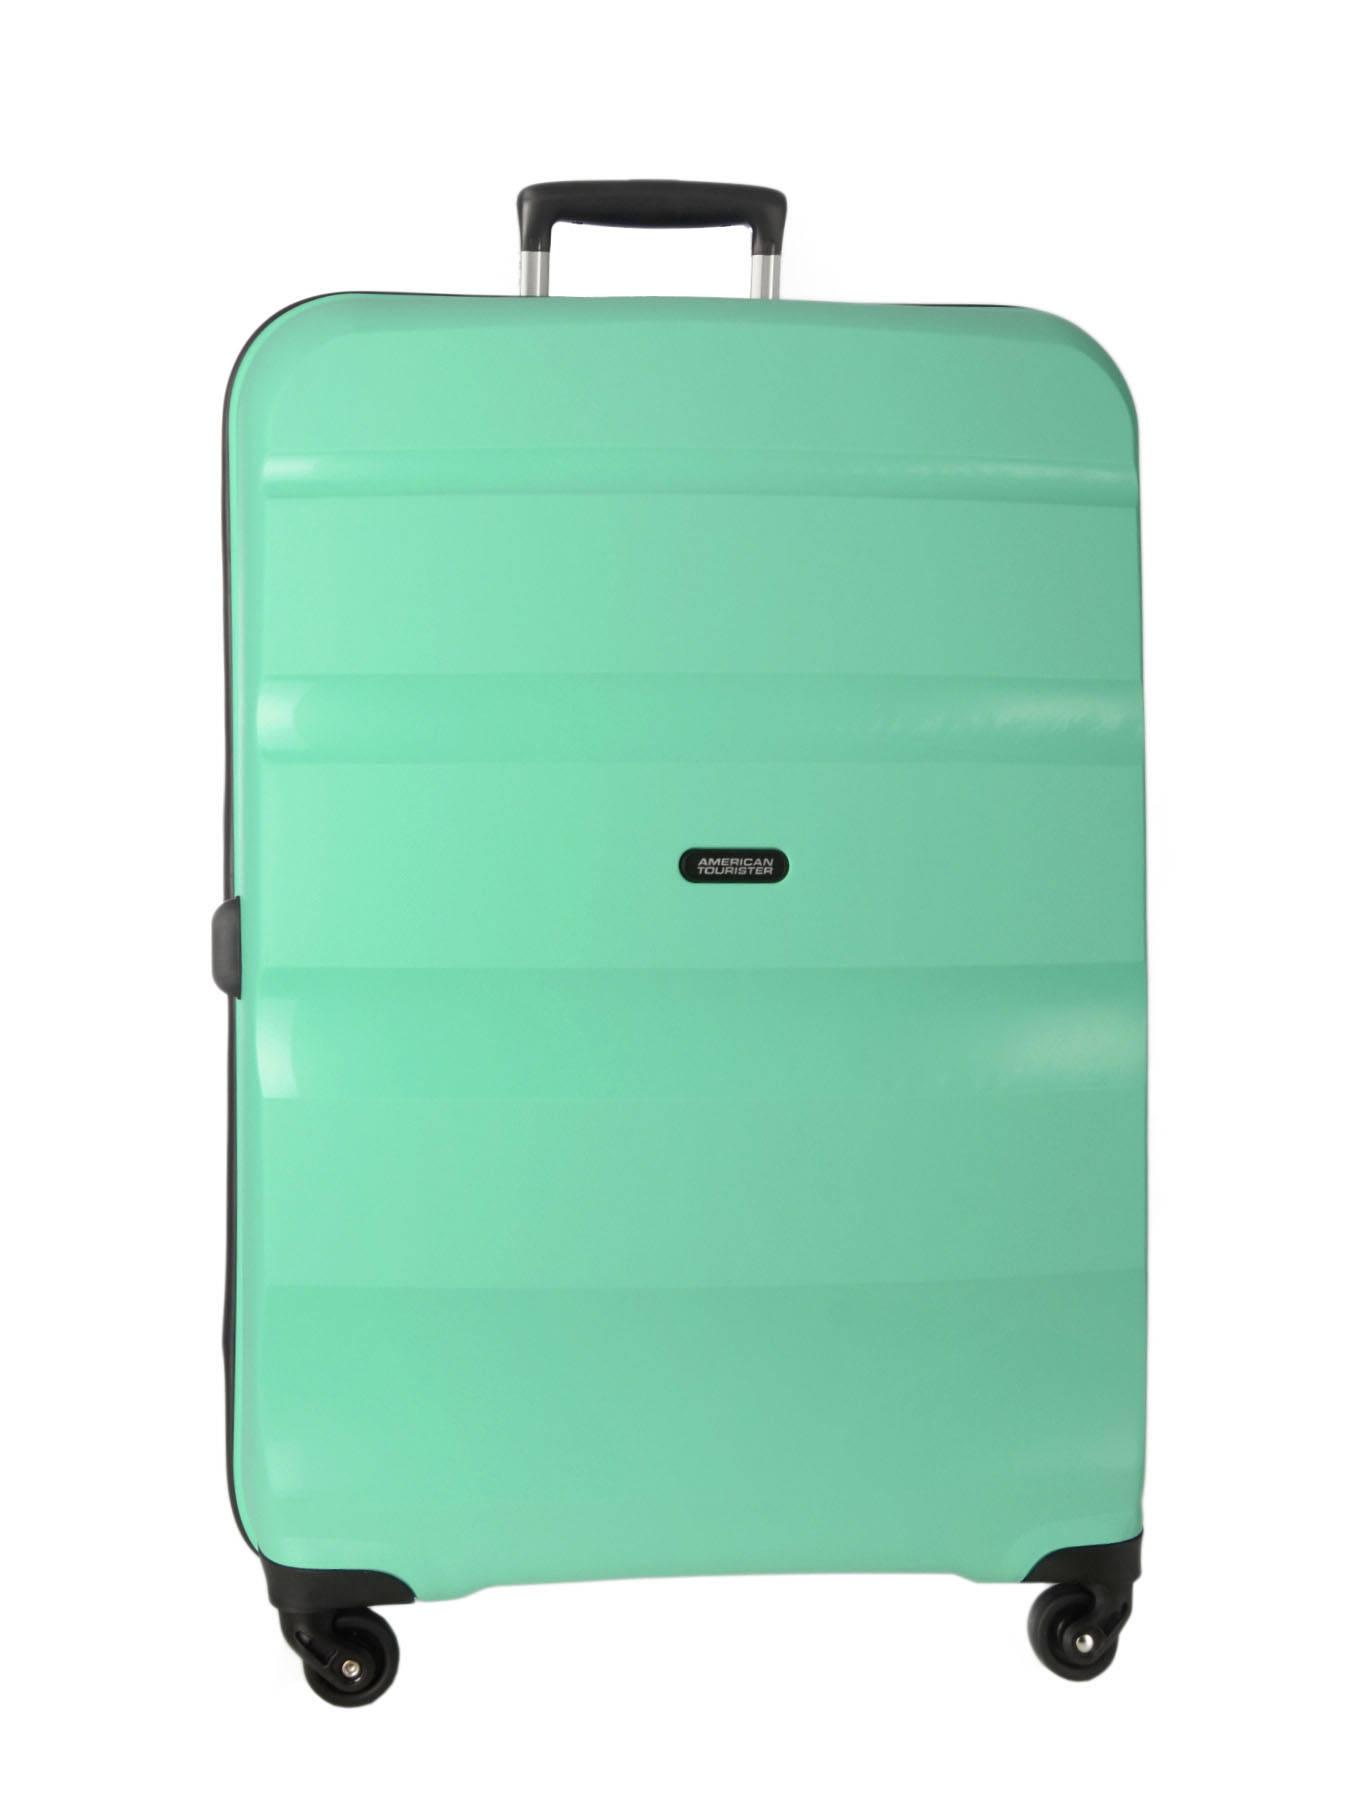 valise rigide american tourister bon air green en vente au meilleur prix. Black Bedroom Furniture Sets. Home Design Ideas